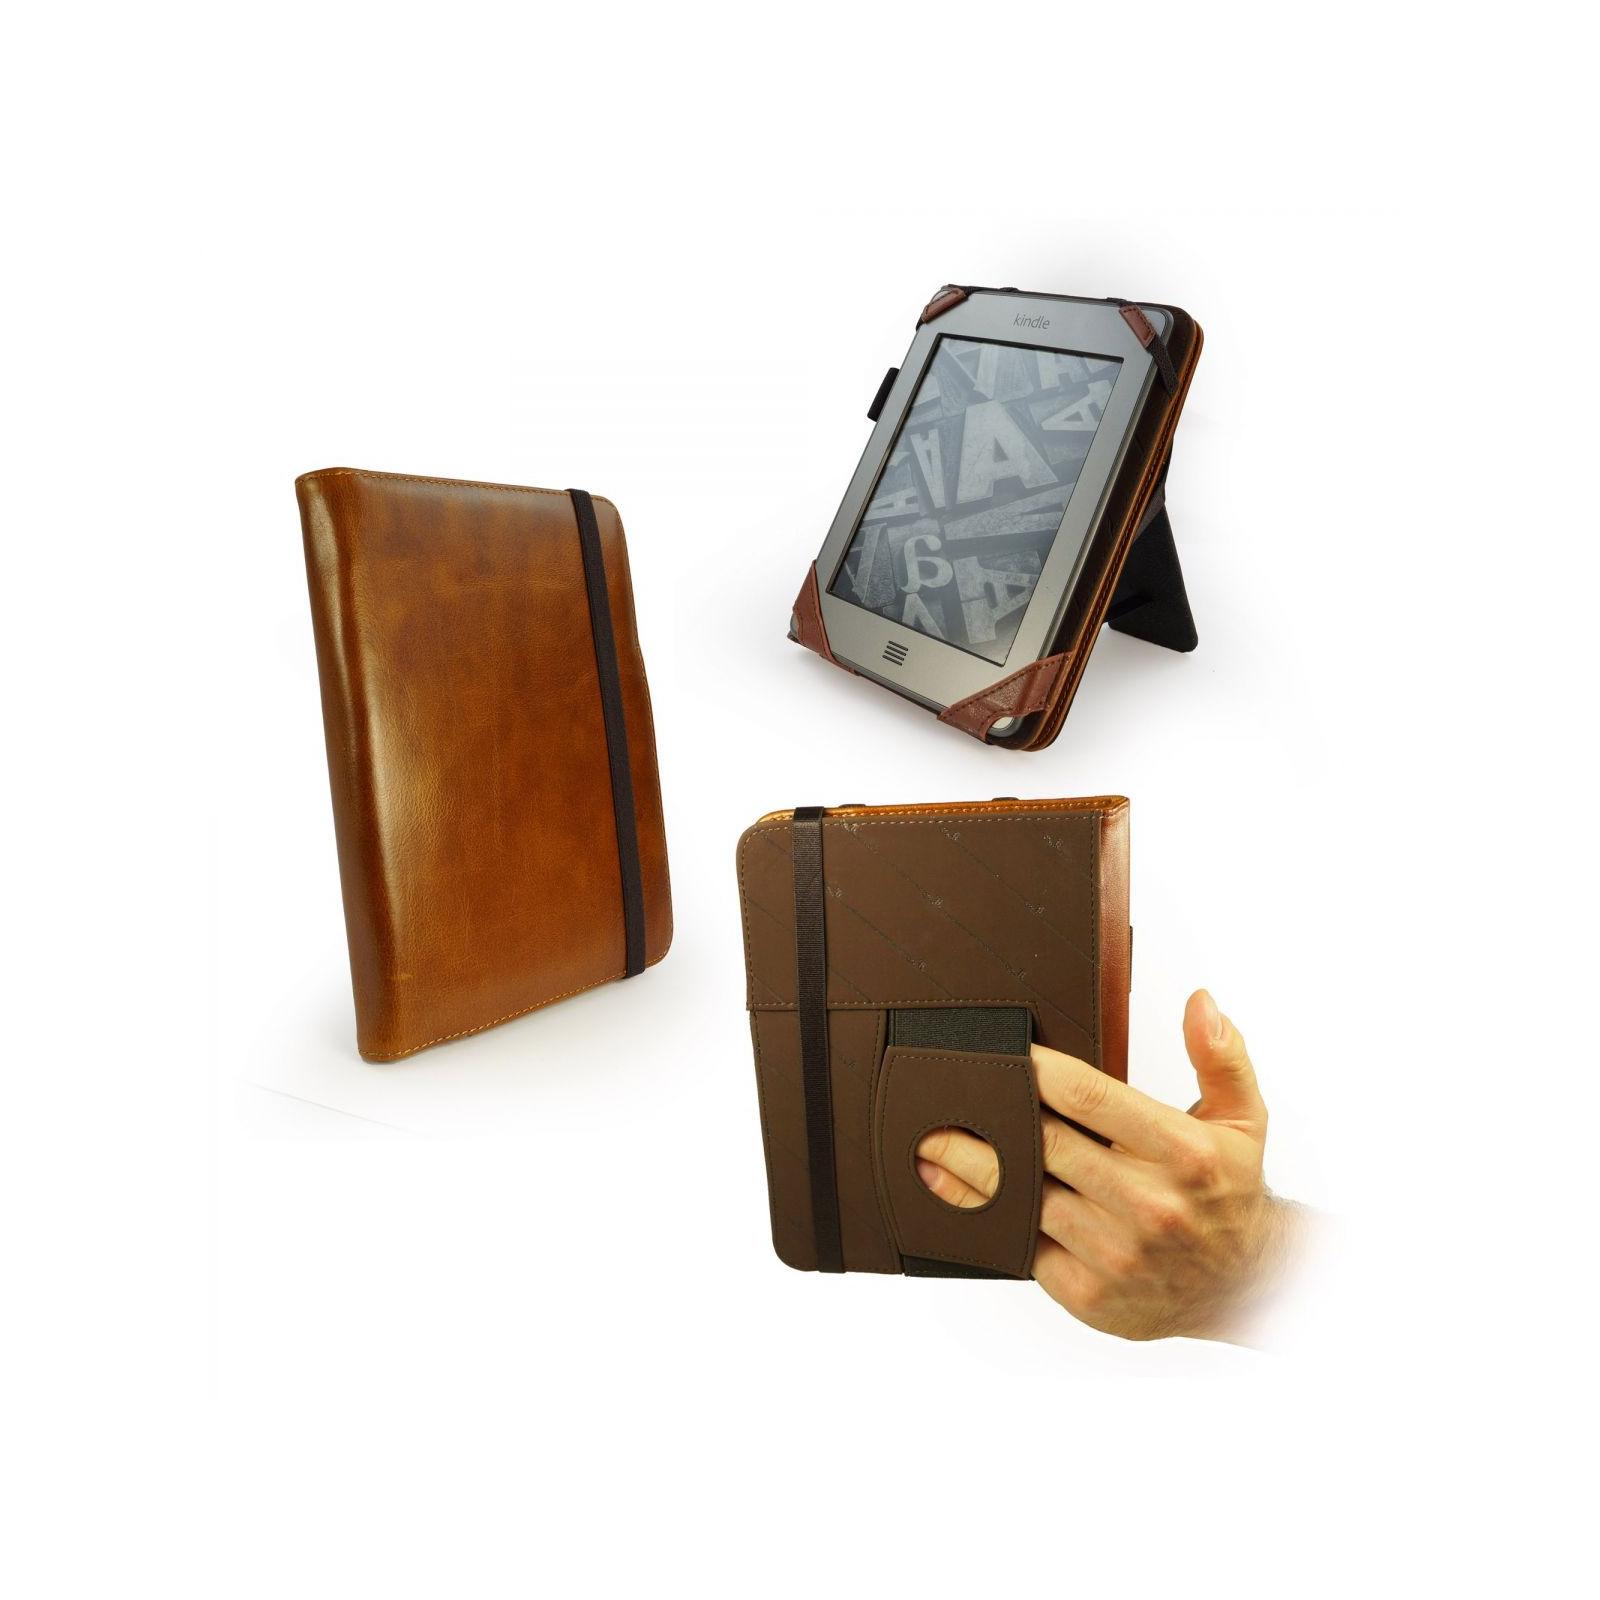 Чехол для электронной книги Tuff-Luv 6 Embrace Plus Leather Vintage Brown (A10_41) изображение 6